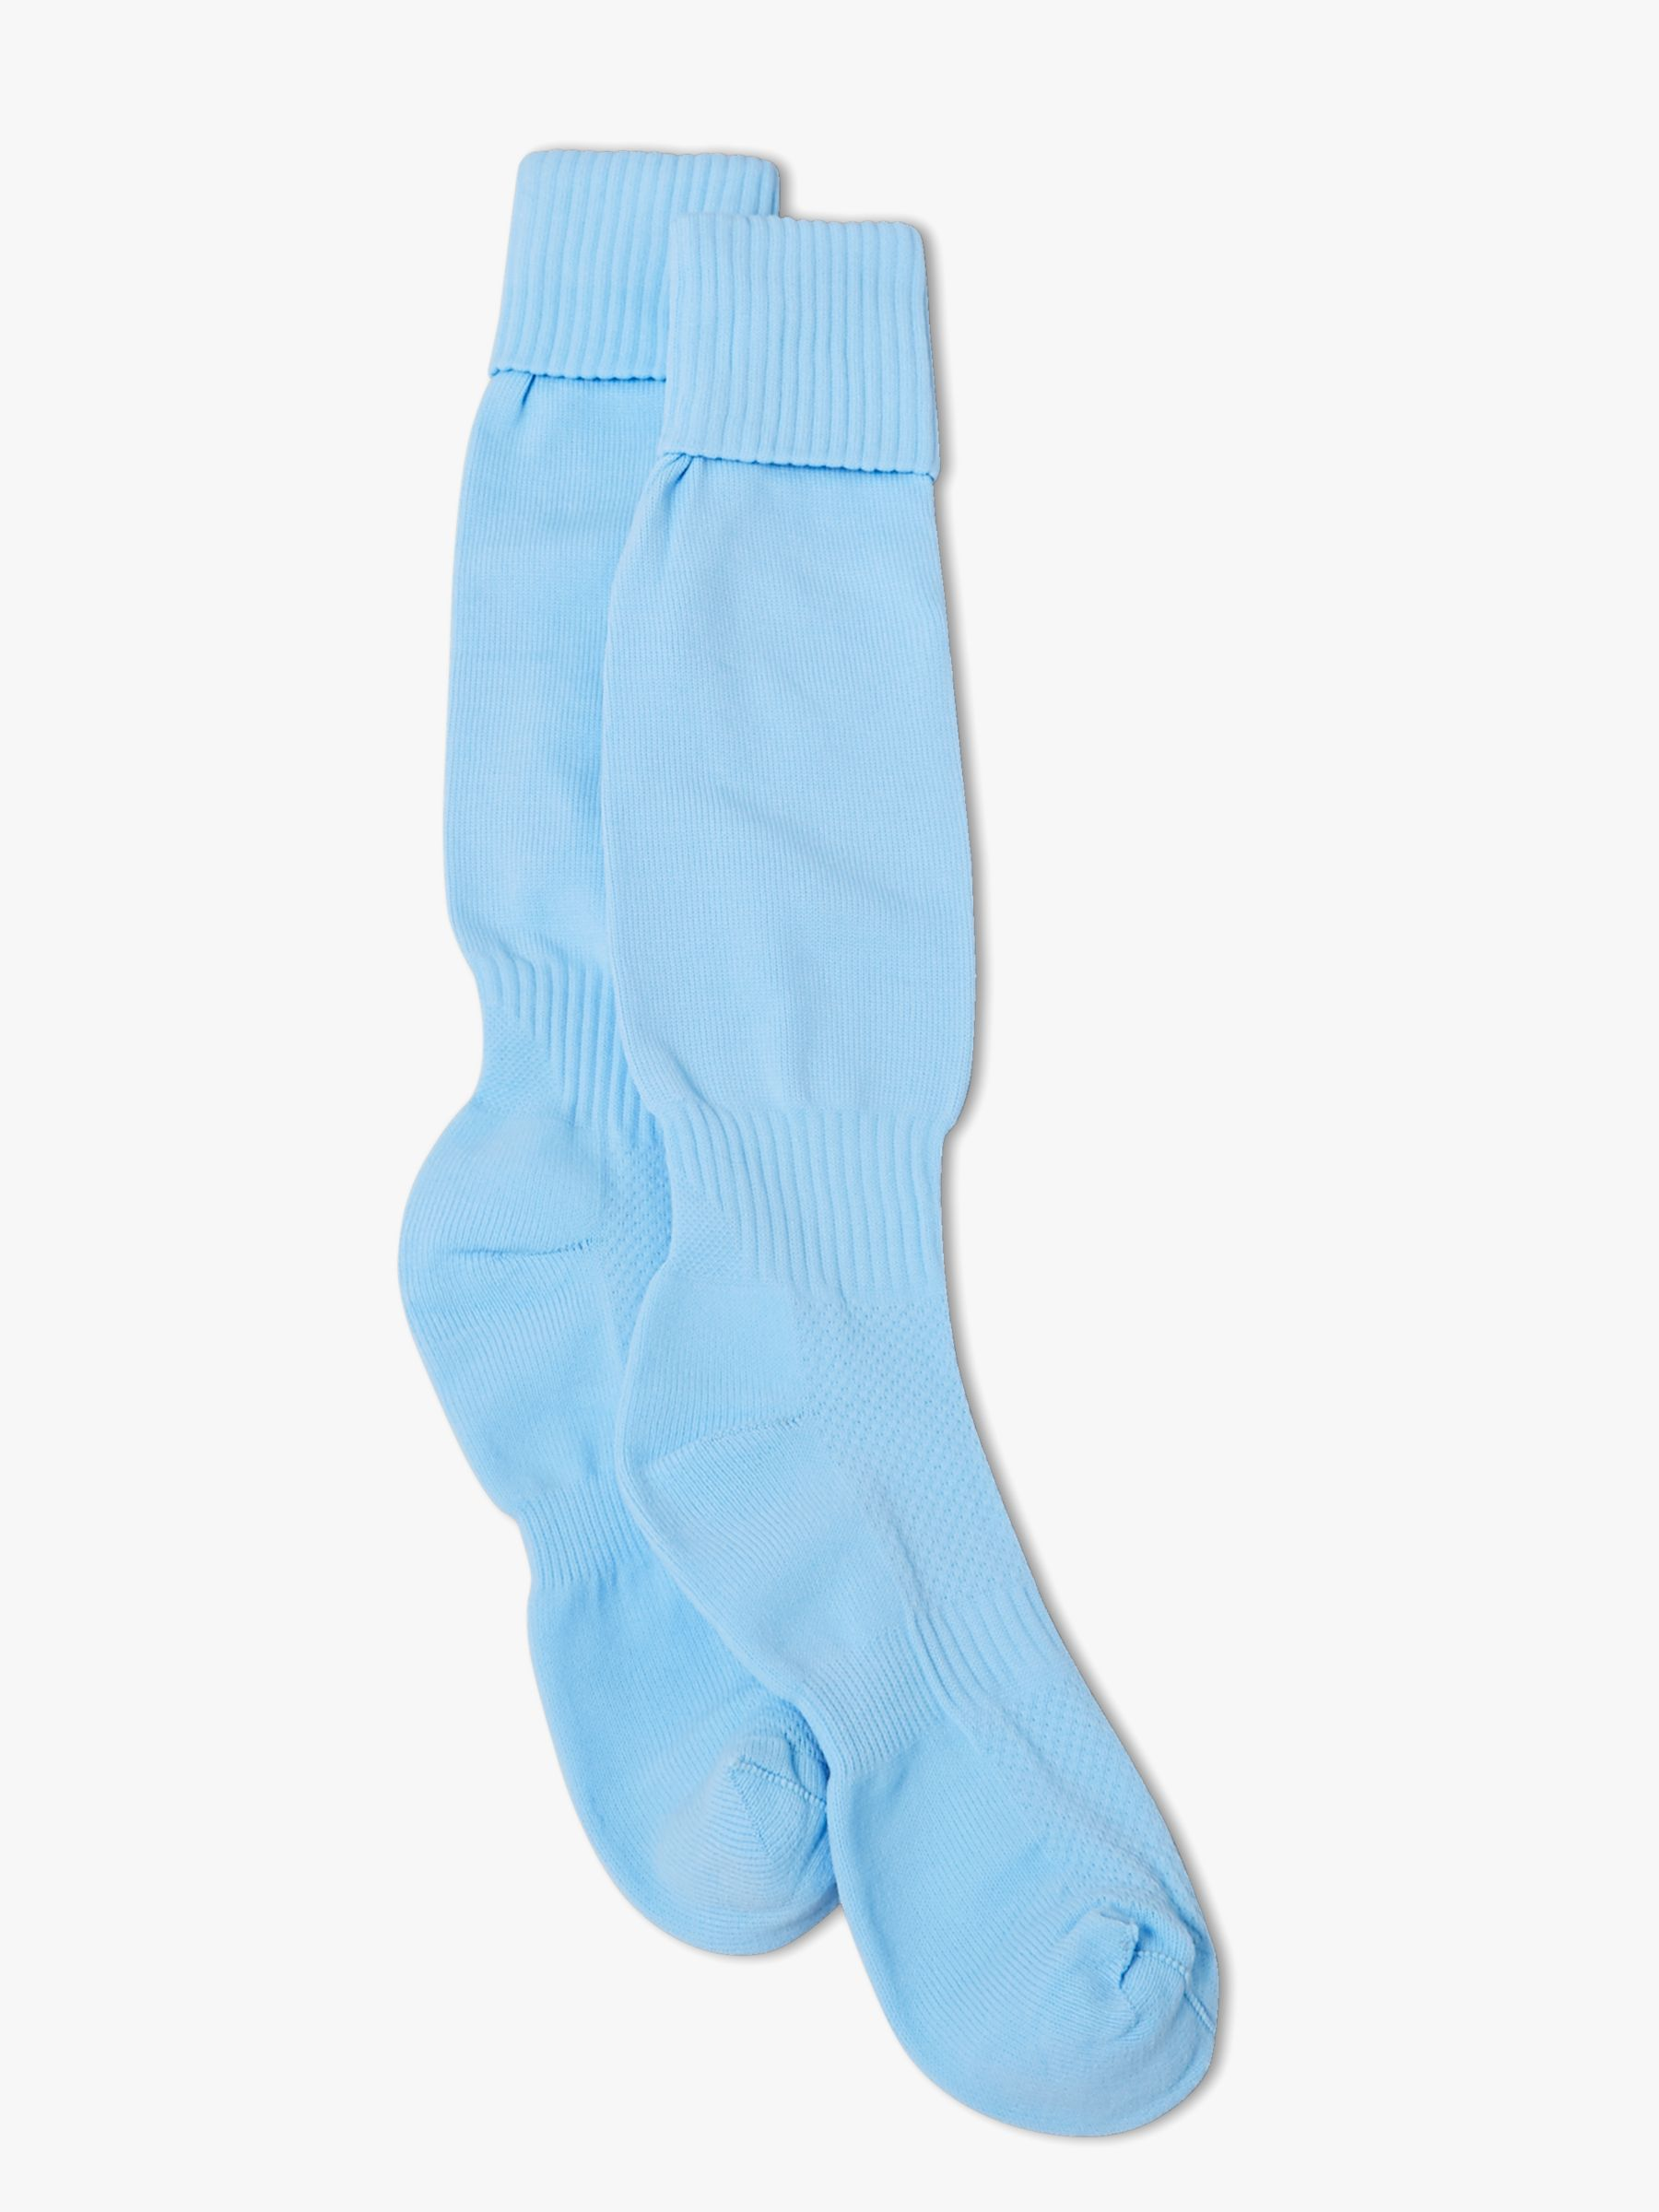 Falcon Unisex Games Socks, Sky Blue